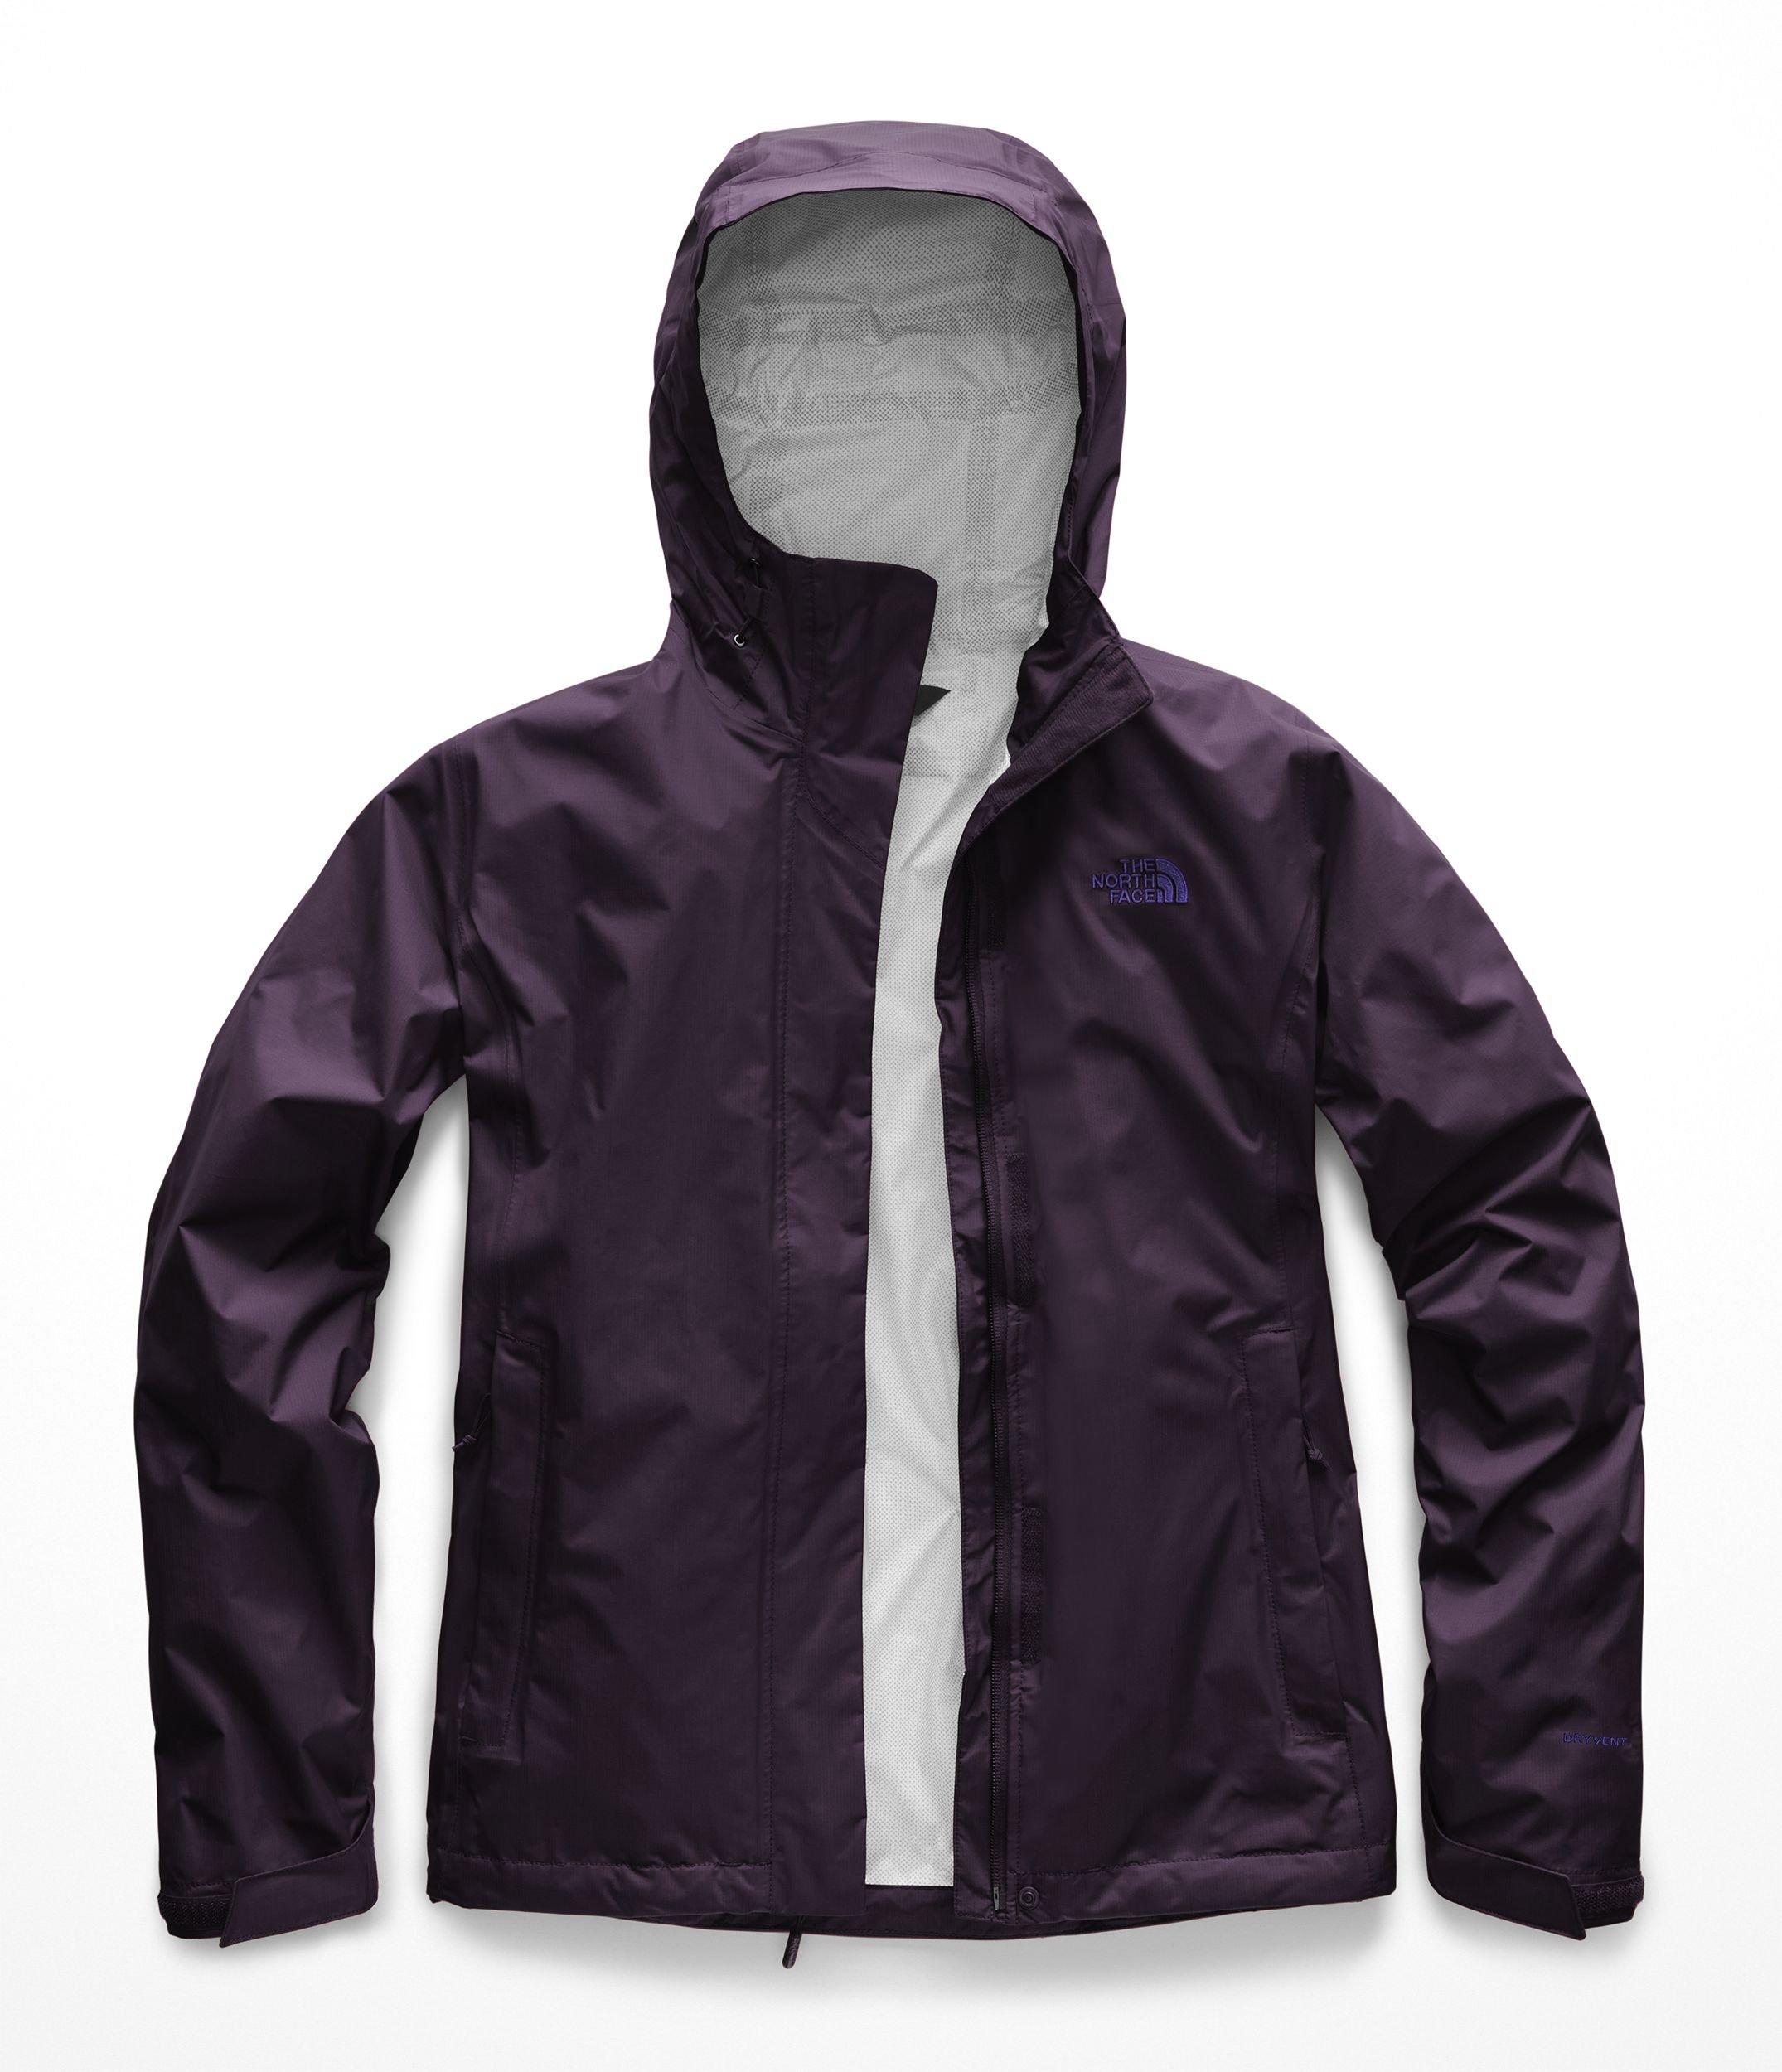 The North Face Women Venture 2 Jacket - Galaxy Purple - S